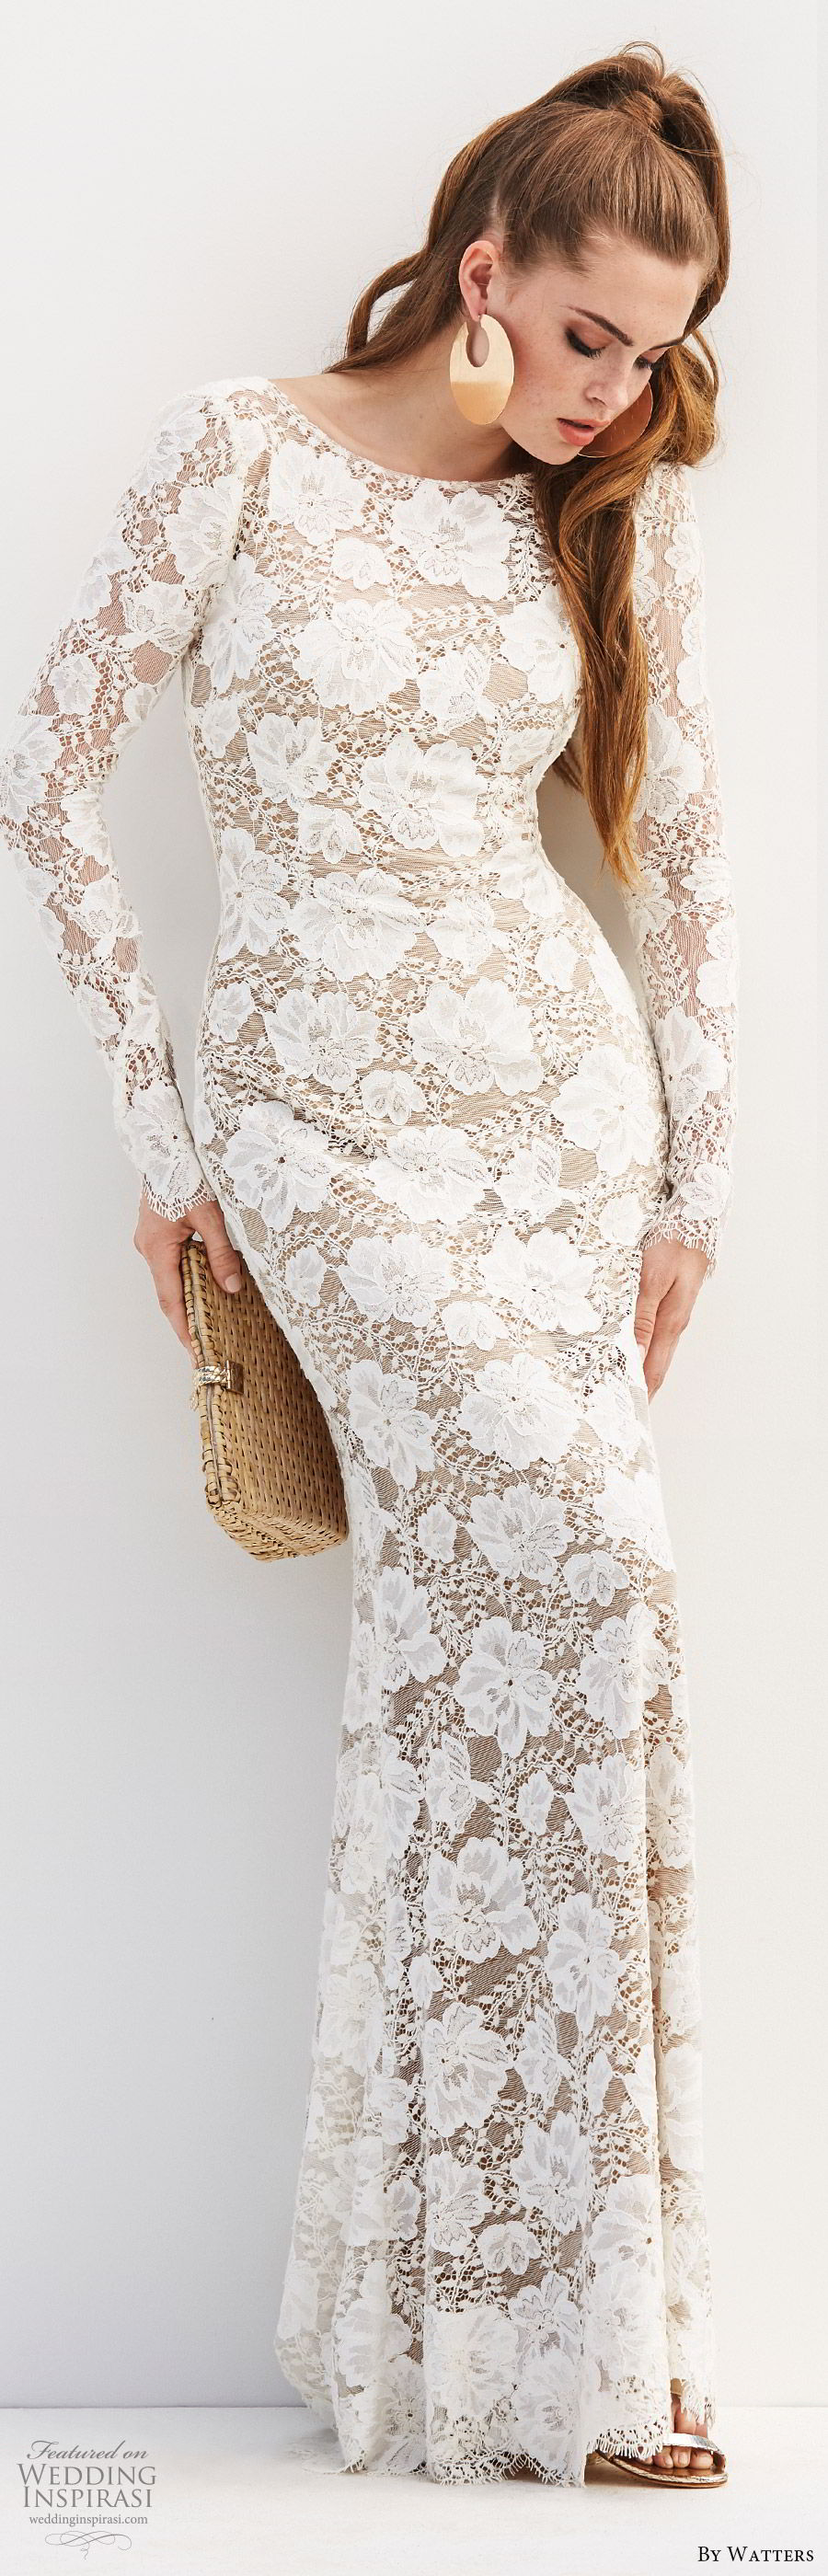 by watters 2020 bridal long sleeve bateau lace sheath wedding dress (1) open scoop back sweep train elegant chic mv